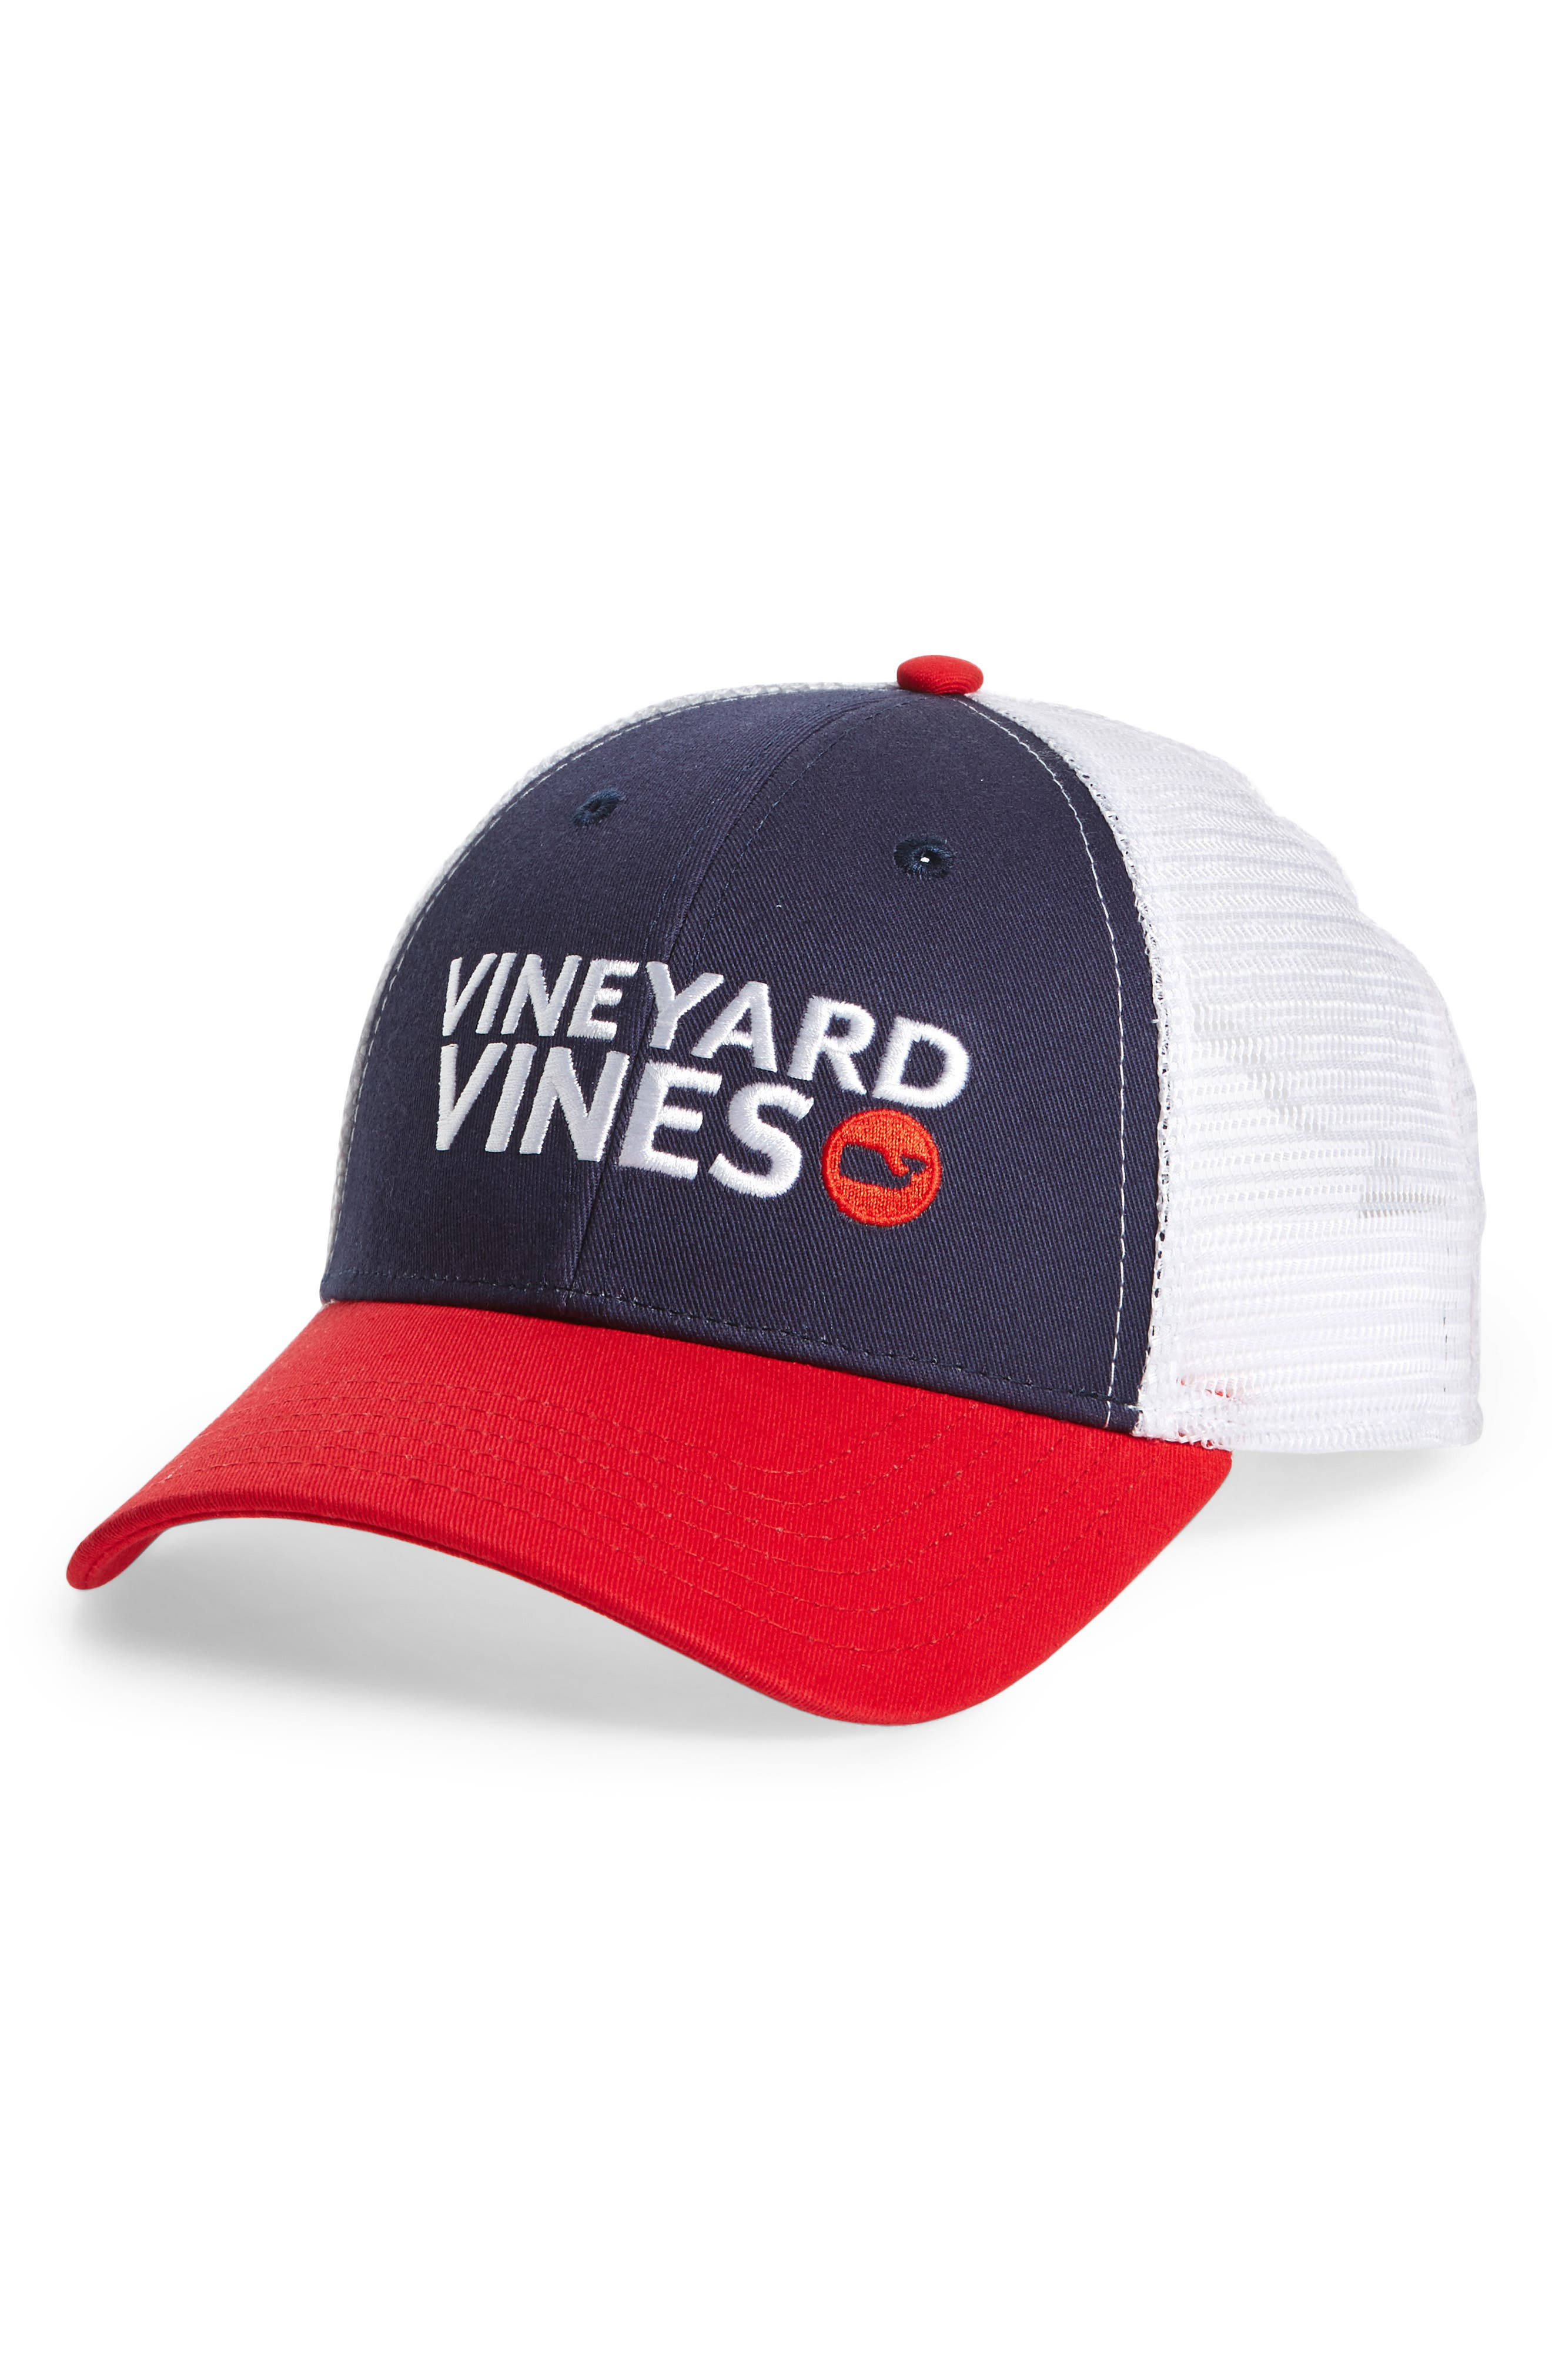 vineyard vines Americana Trucker Cap